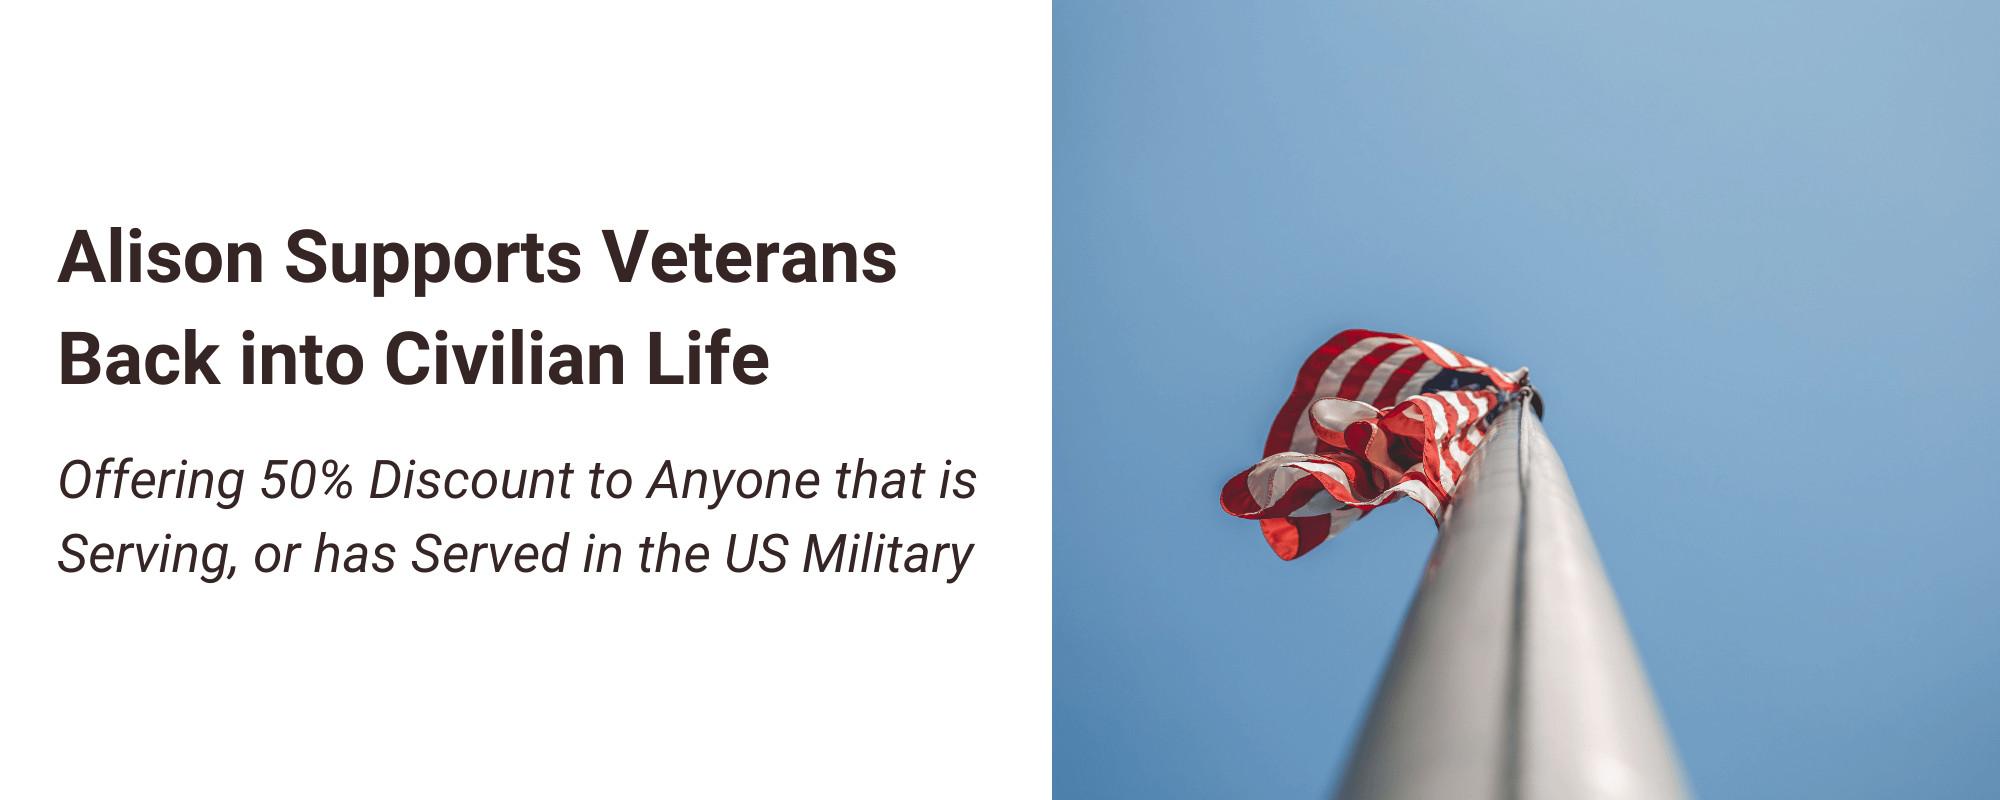 Alison Supports Veterans Back into Civilian Life